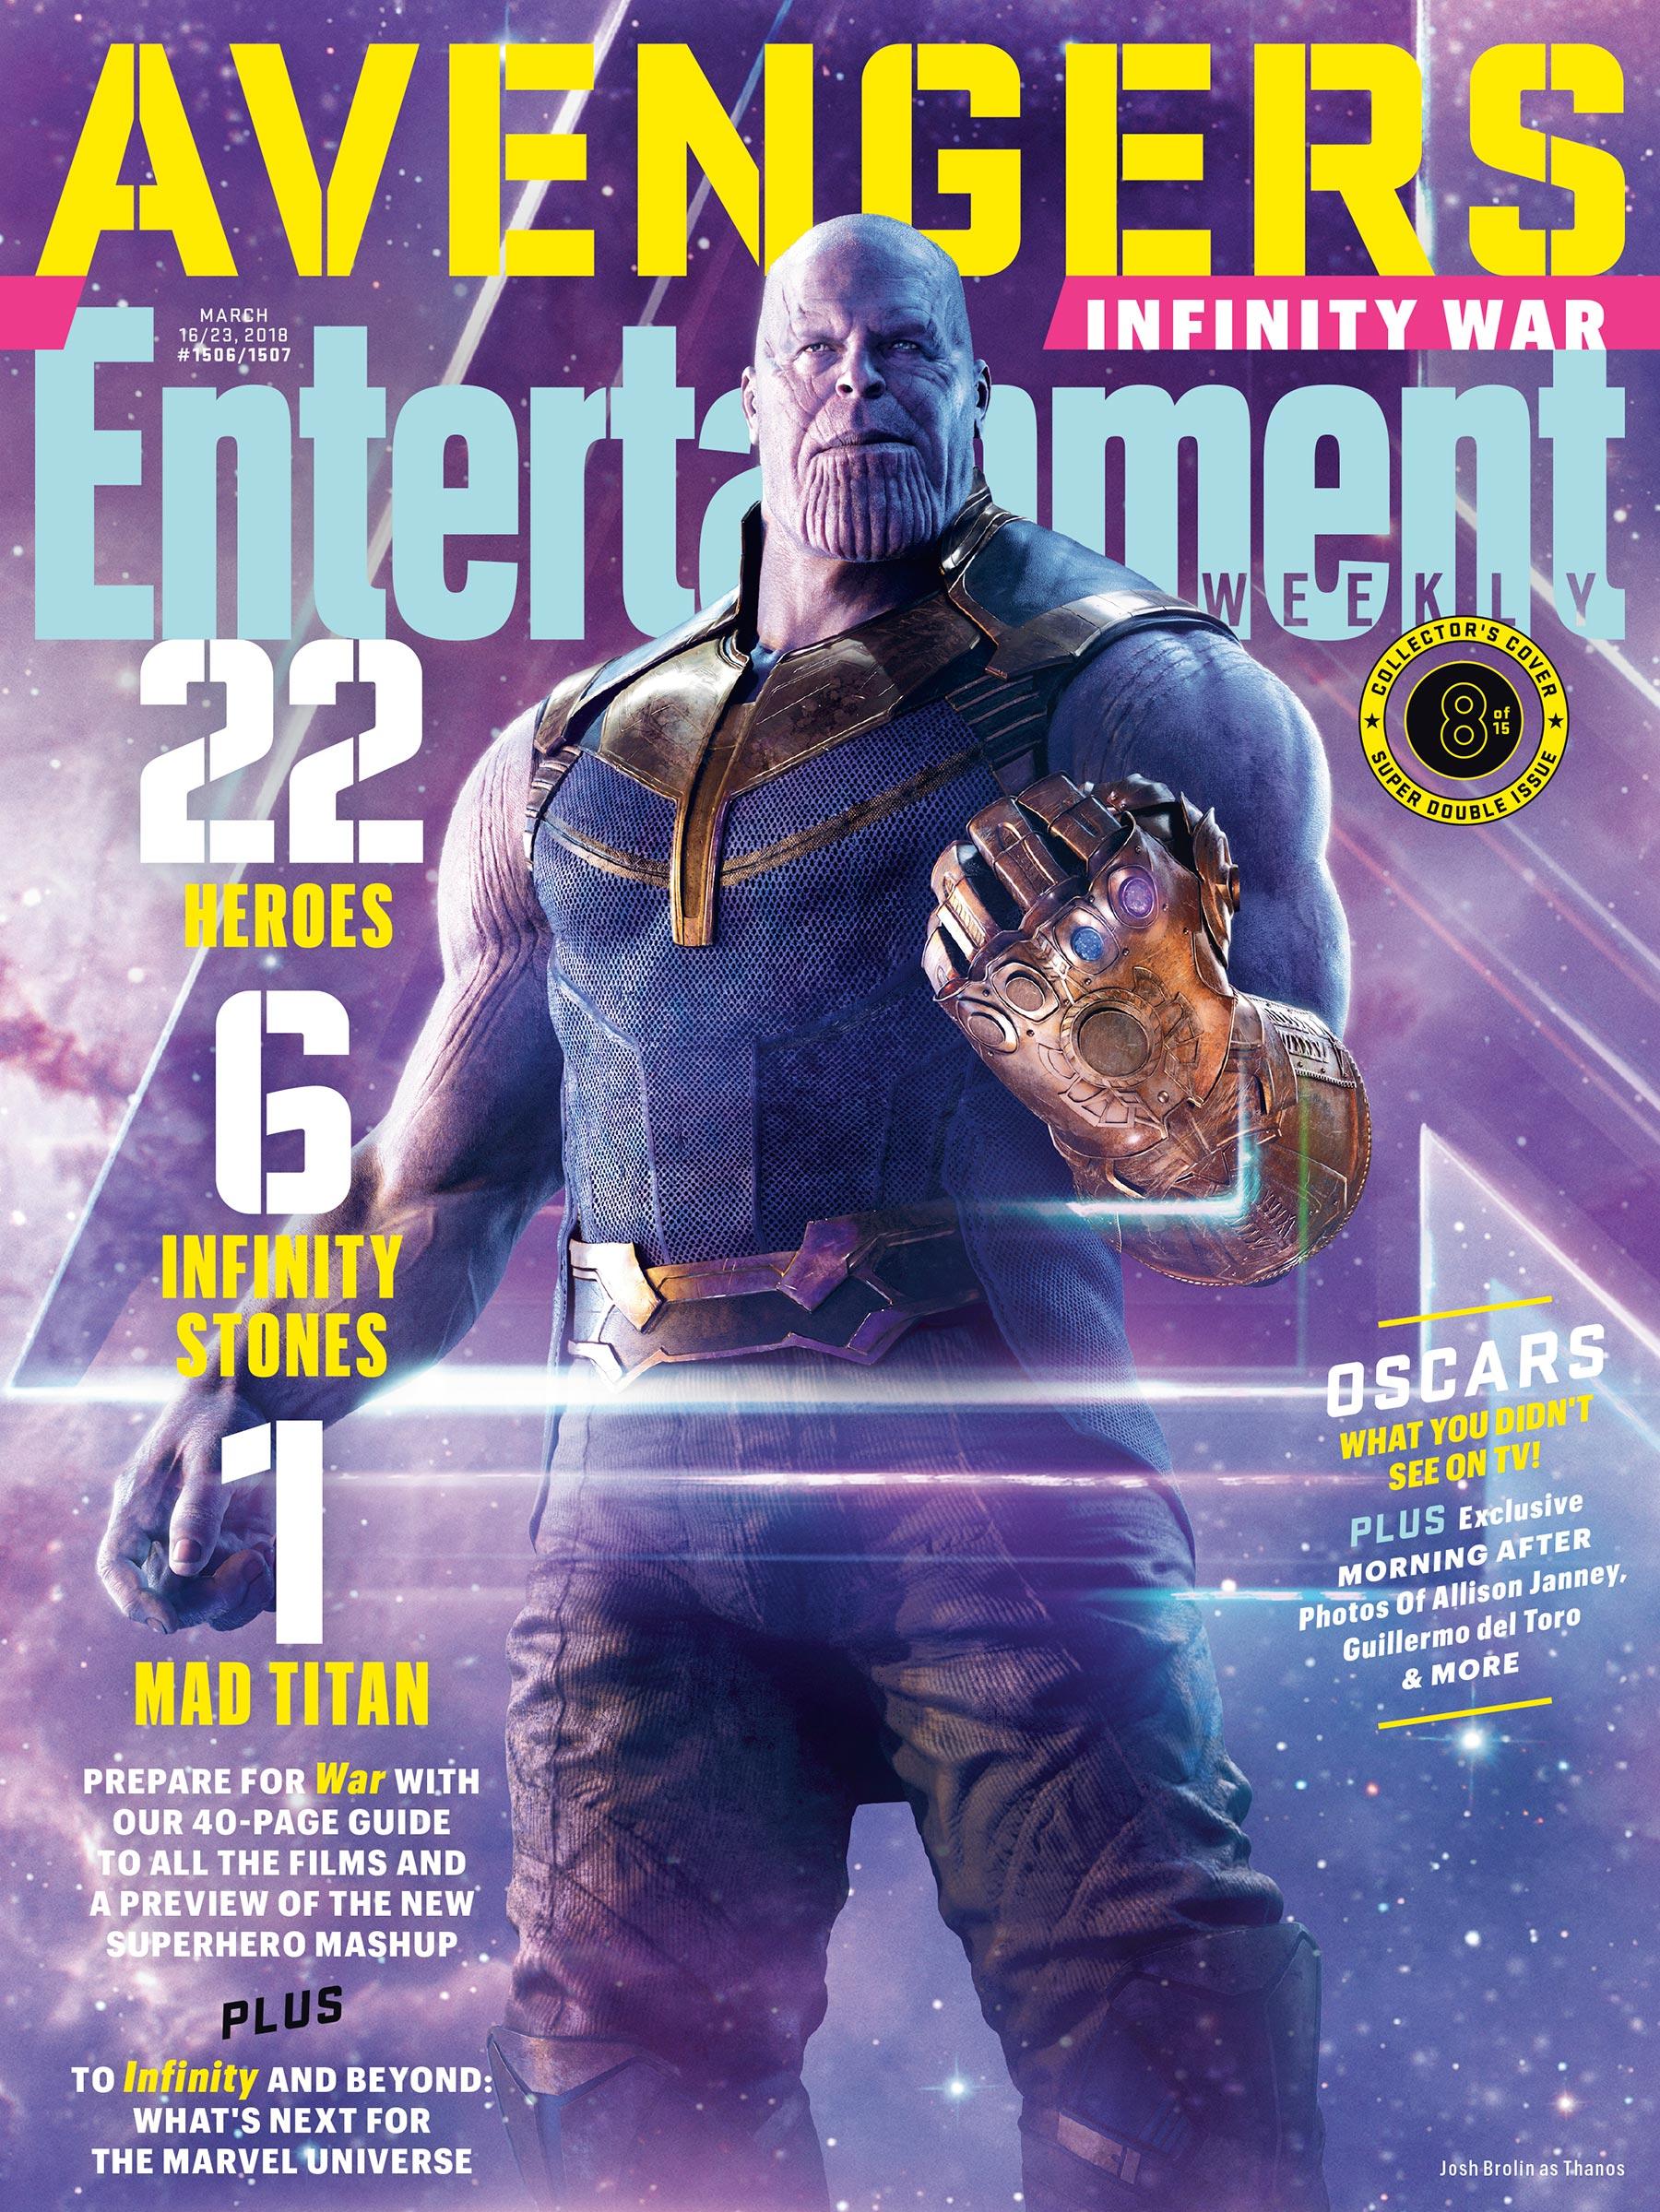 Avengers Infinity War: Thanos The Mad Titan Skin Minecraft Skin